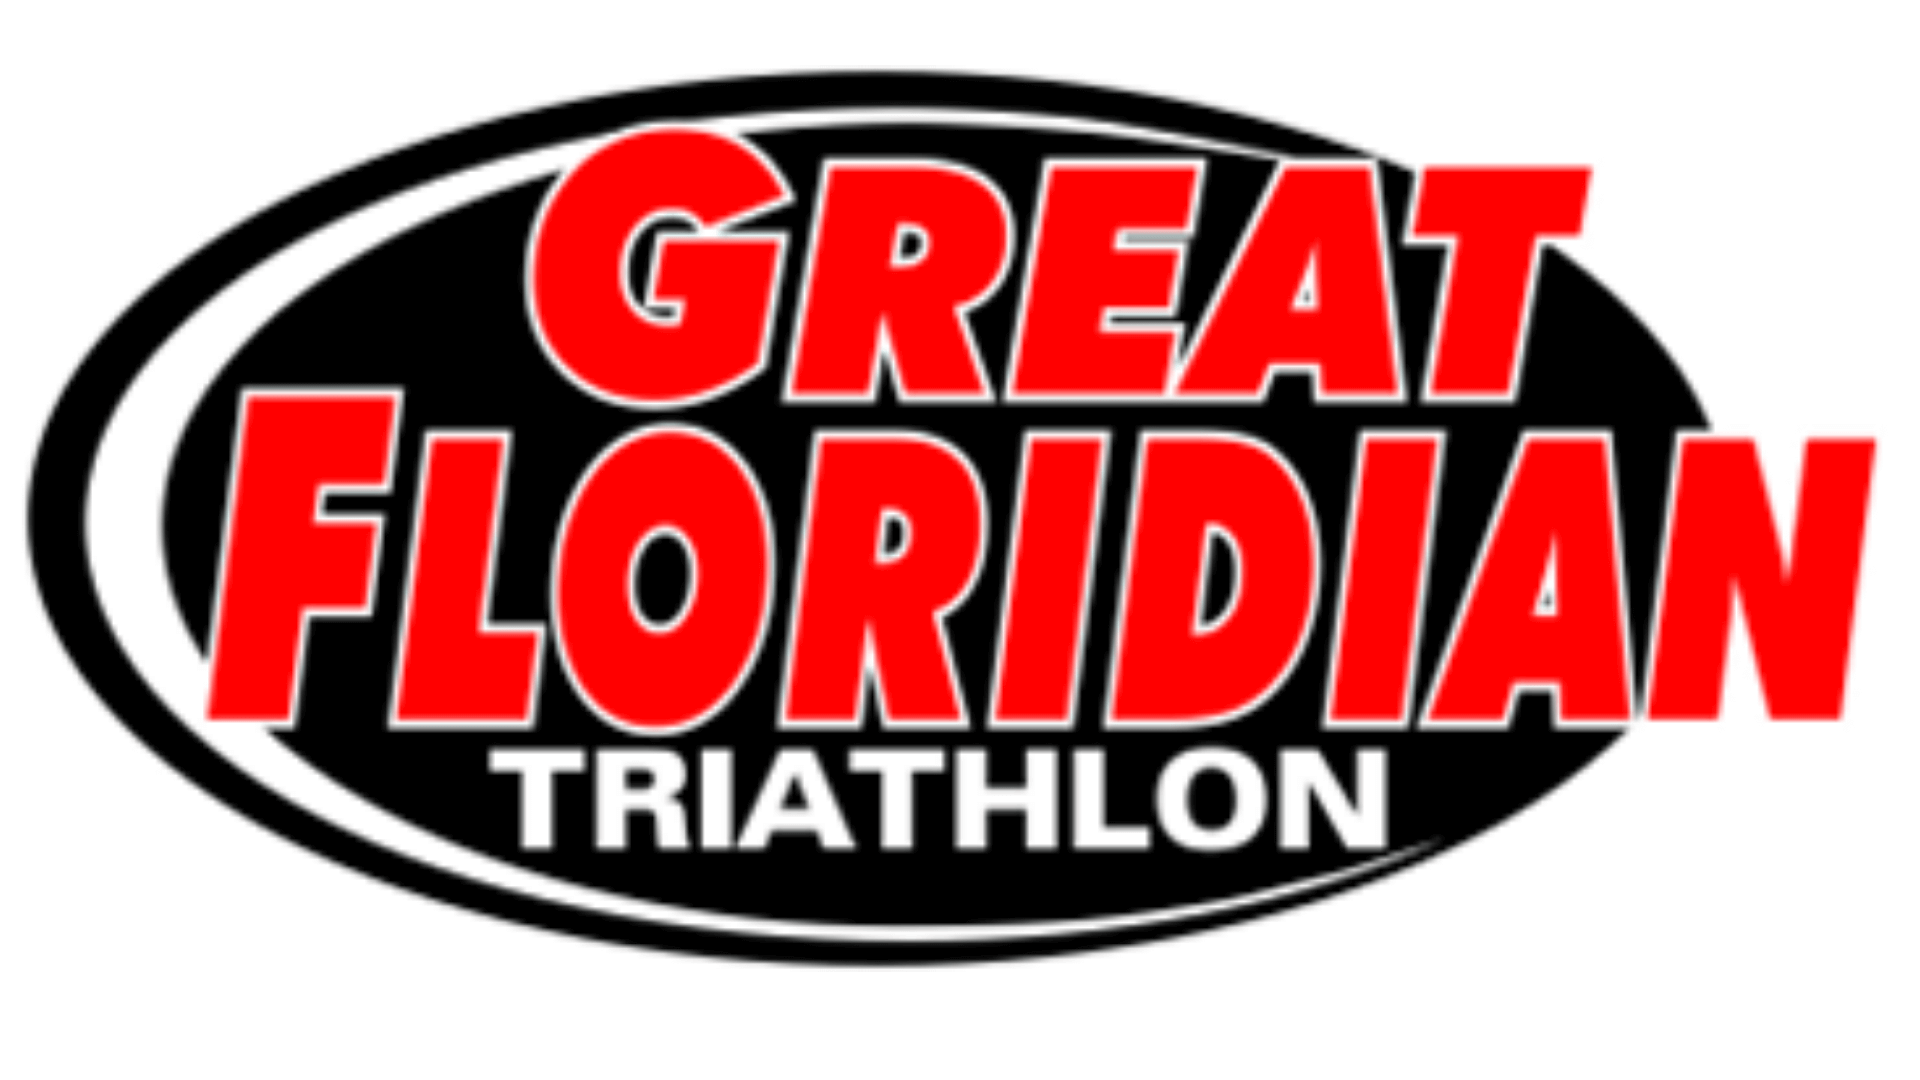 Great Floridian Triathlon